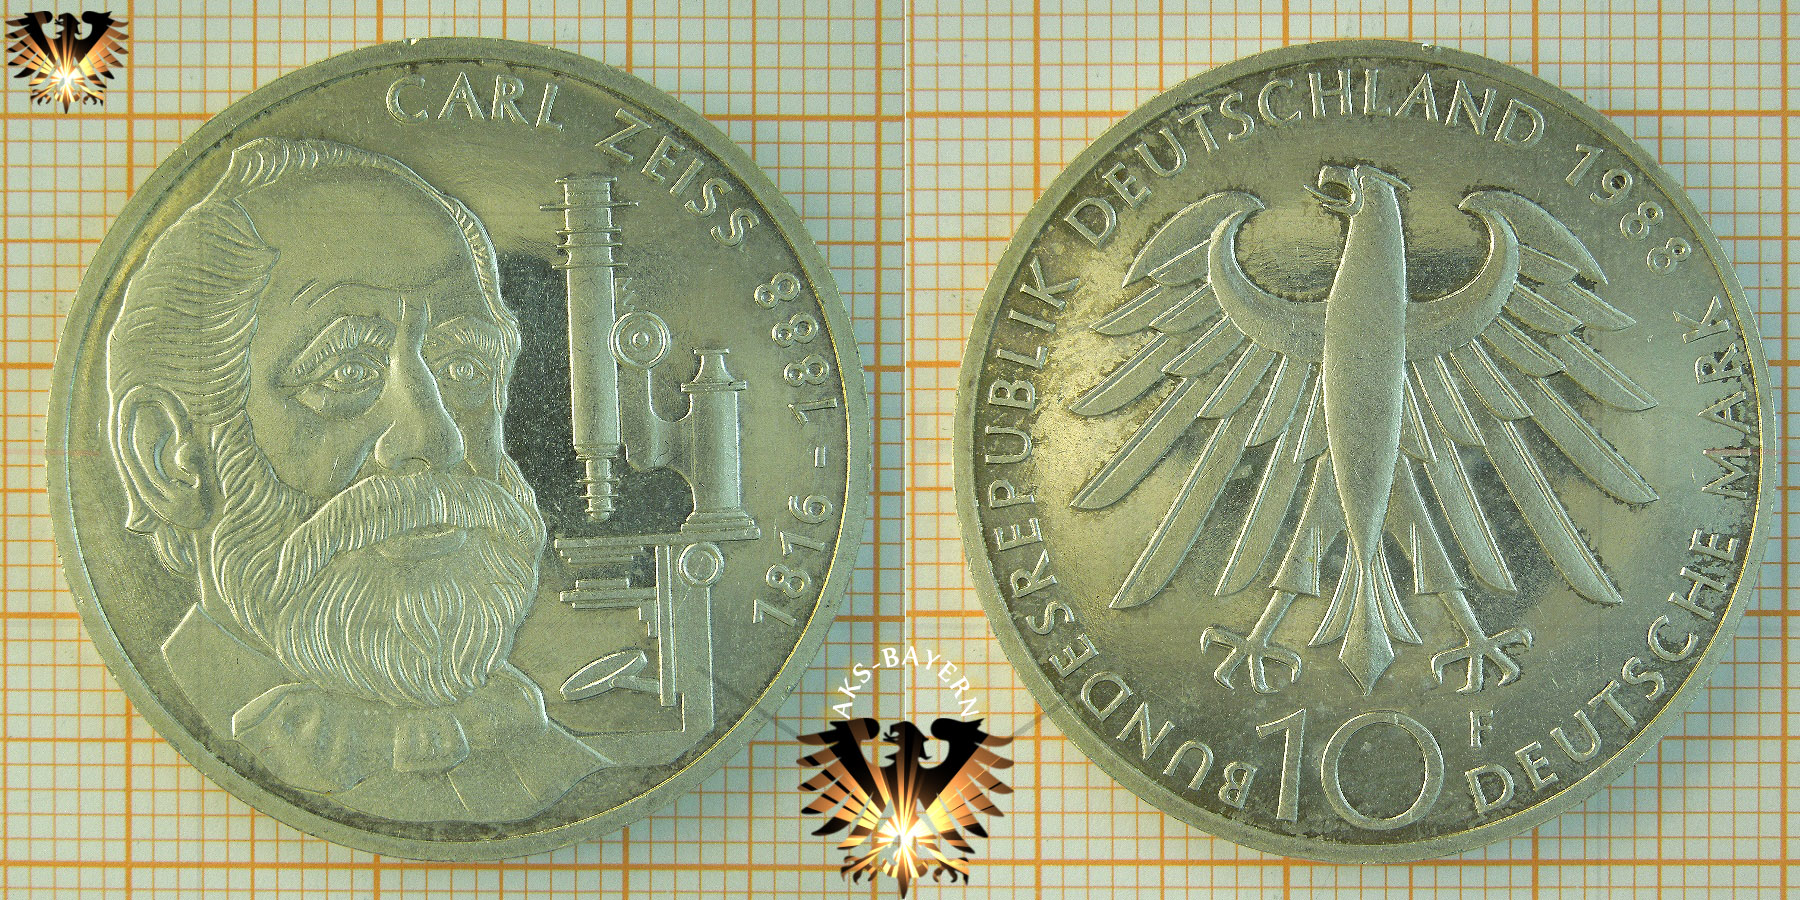 10 Dm Brd 1988 F Carl Zeiss 1816 1888